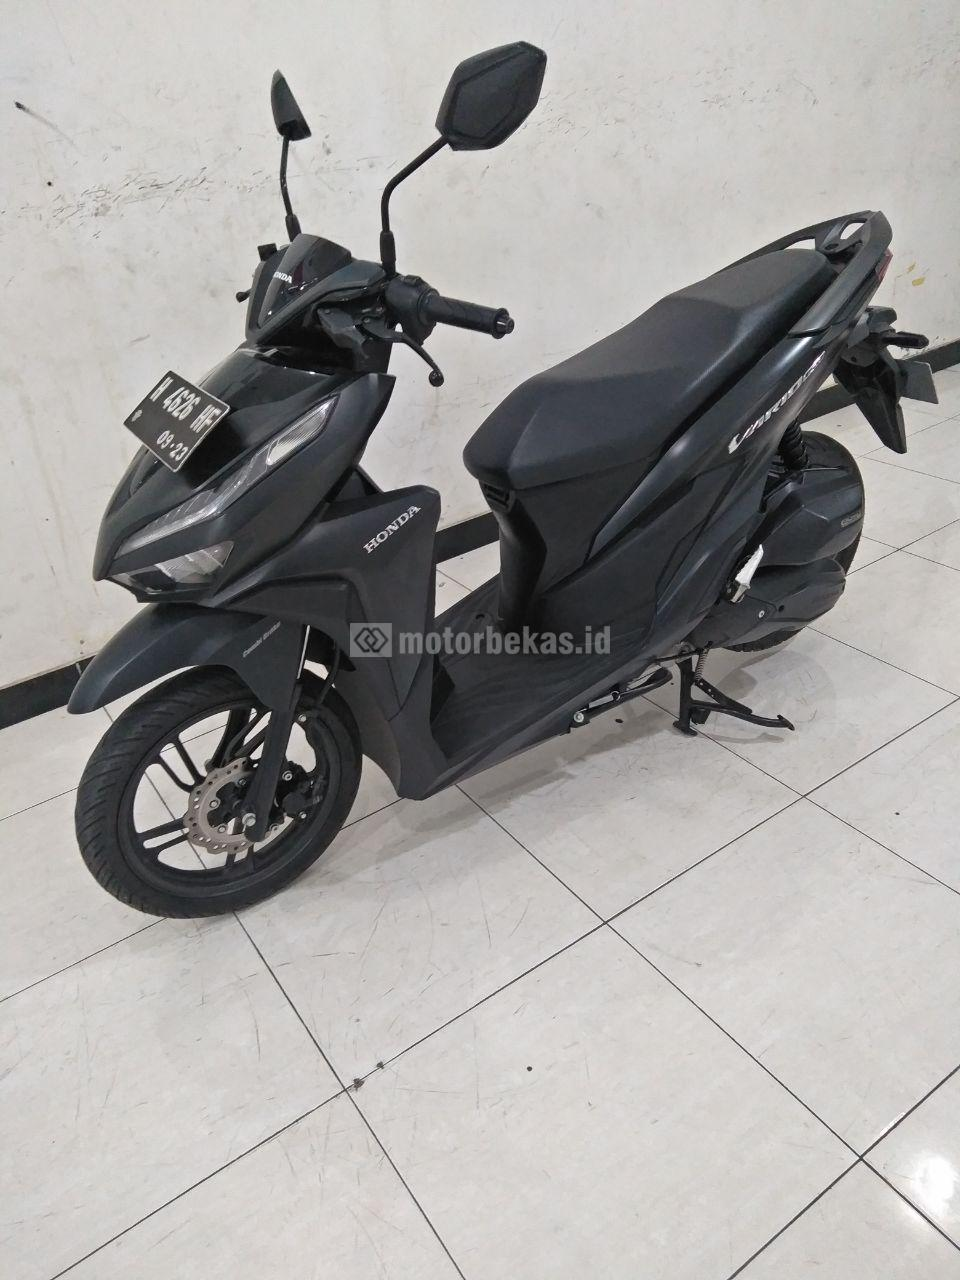 HONDA VARIO 150 SPORTY  3280 motorbekas.id